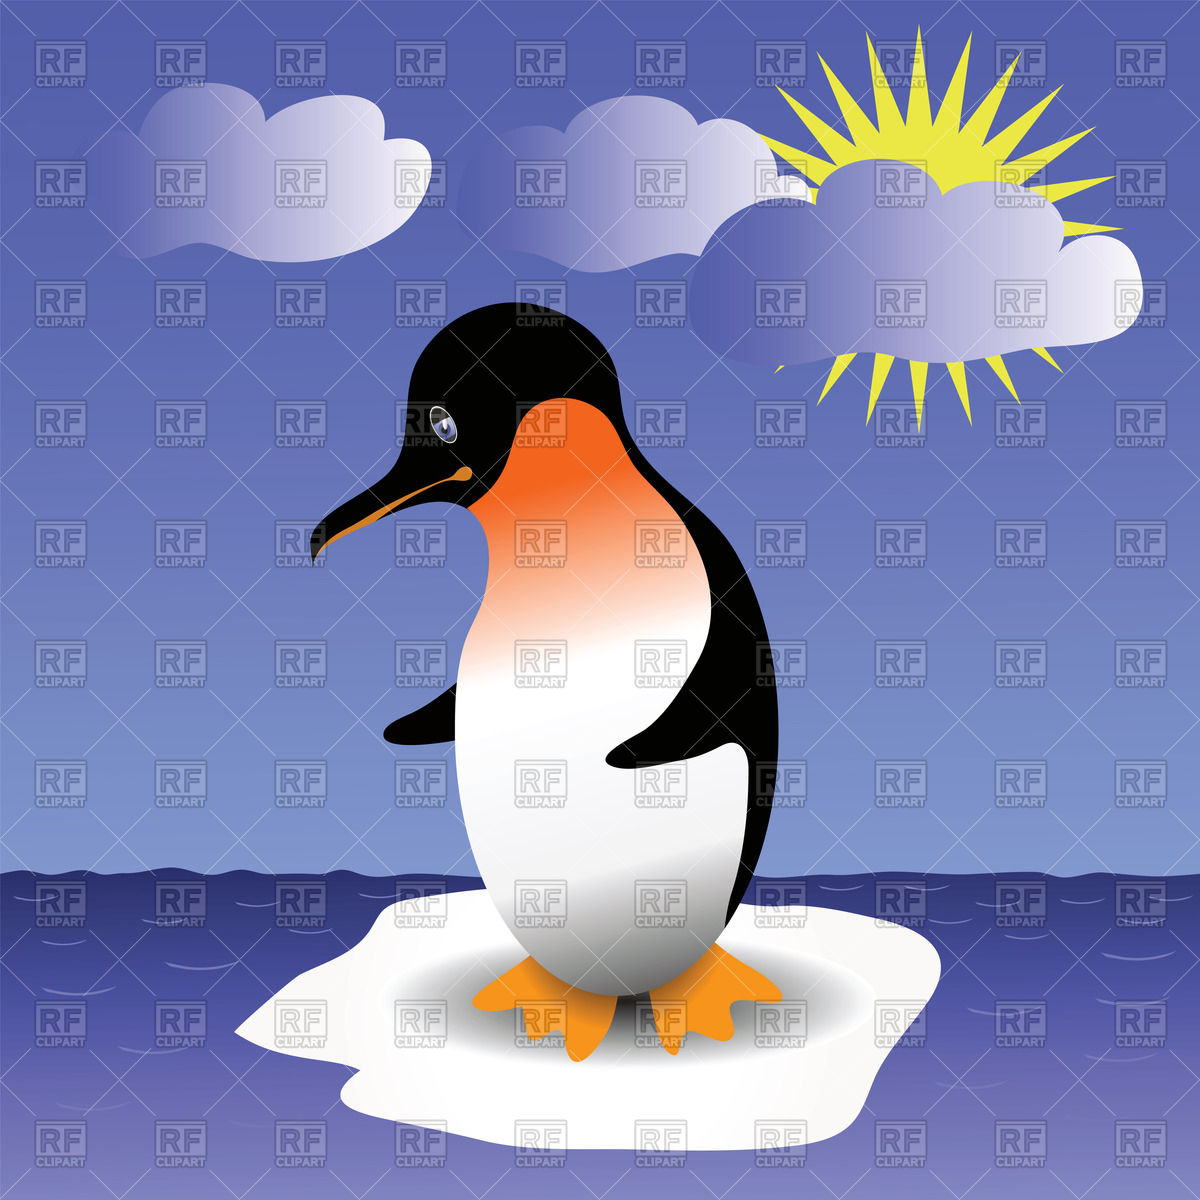 Penguin on drifting ice floe Vector Image #39203.